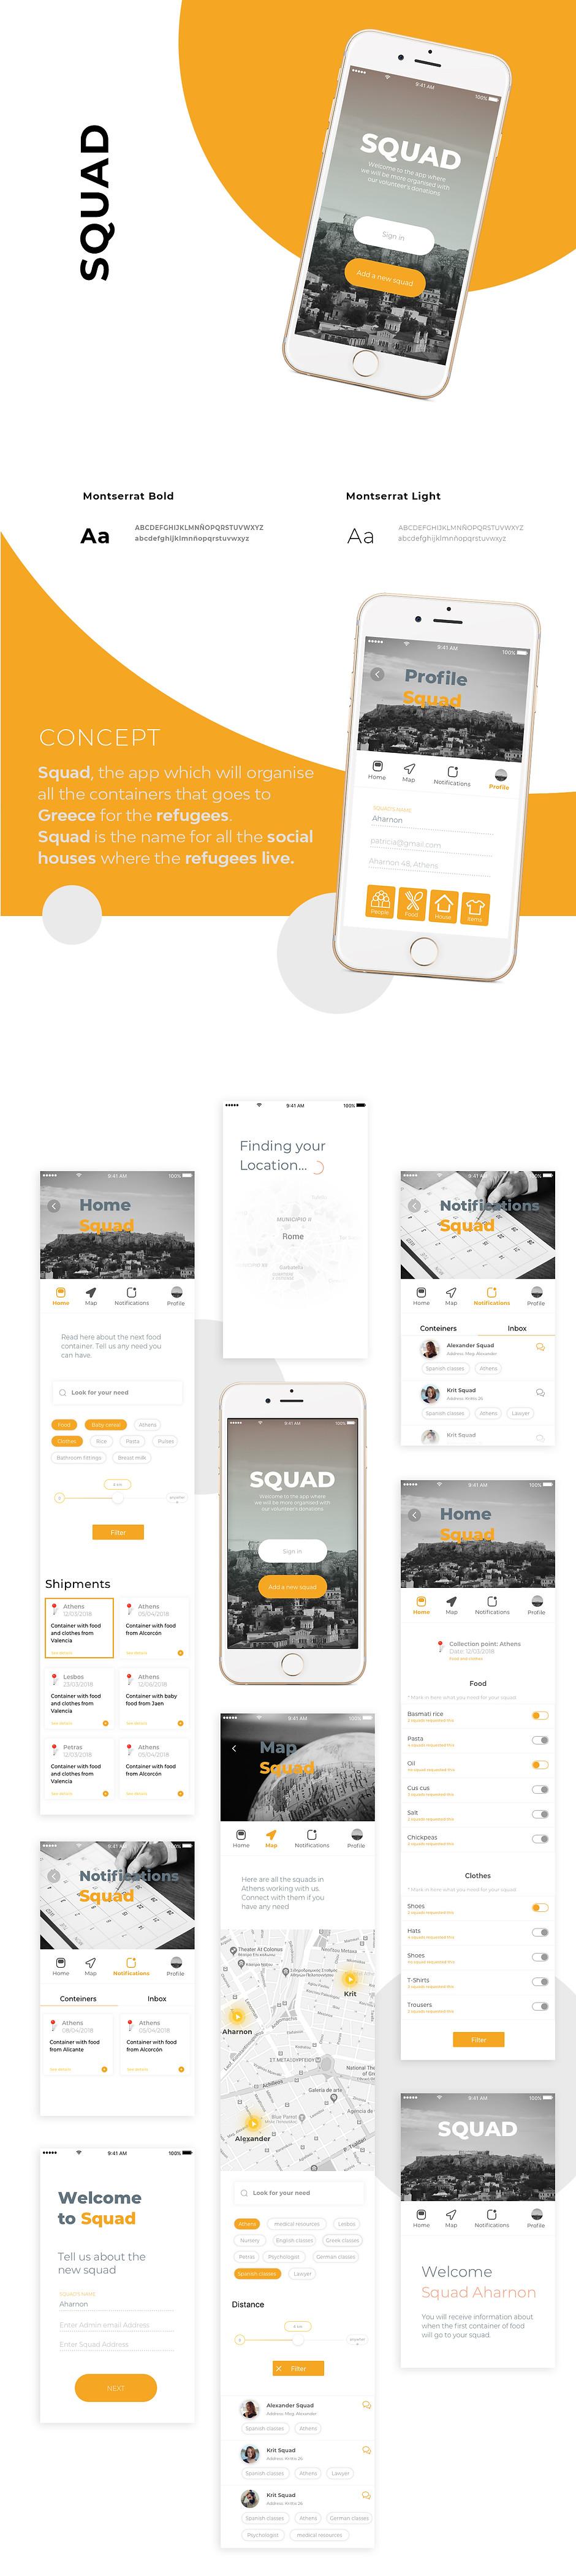 Squad app view